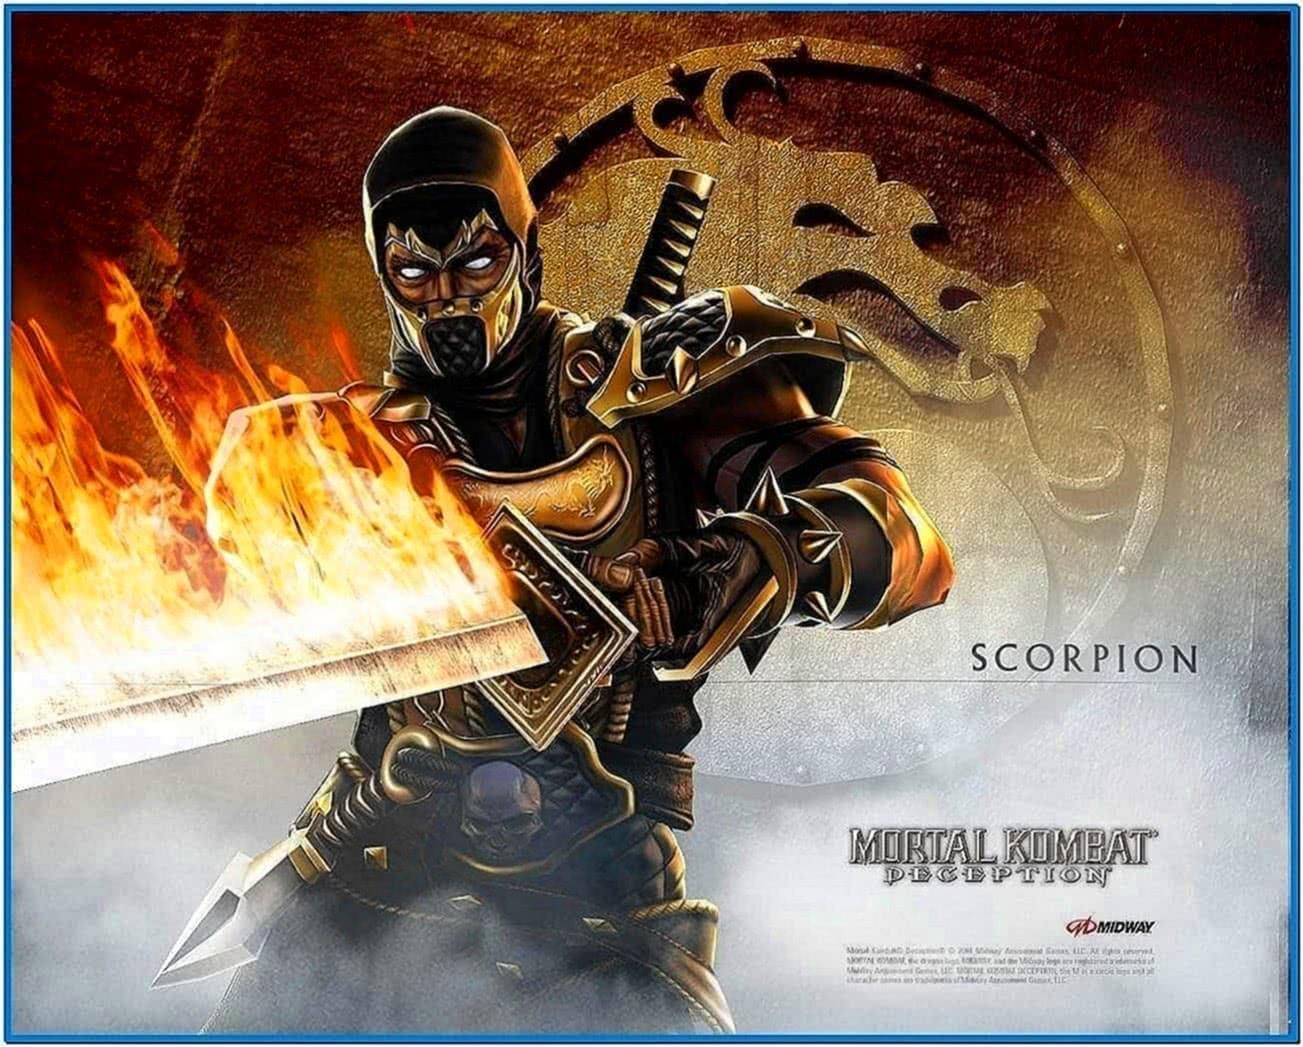 Mortal Kombat Scorpion Screensaver